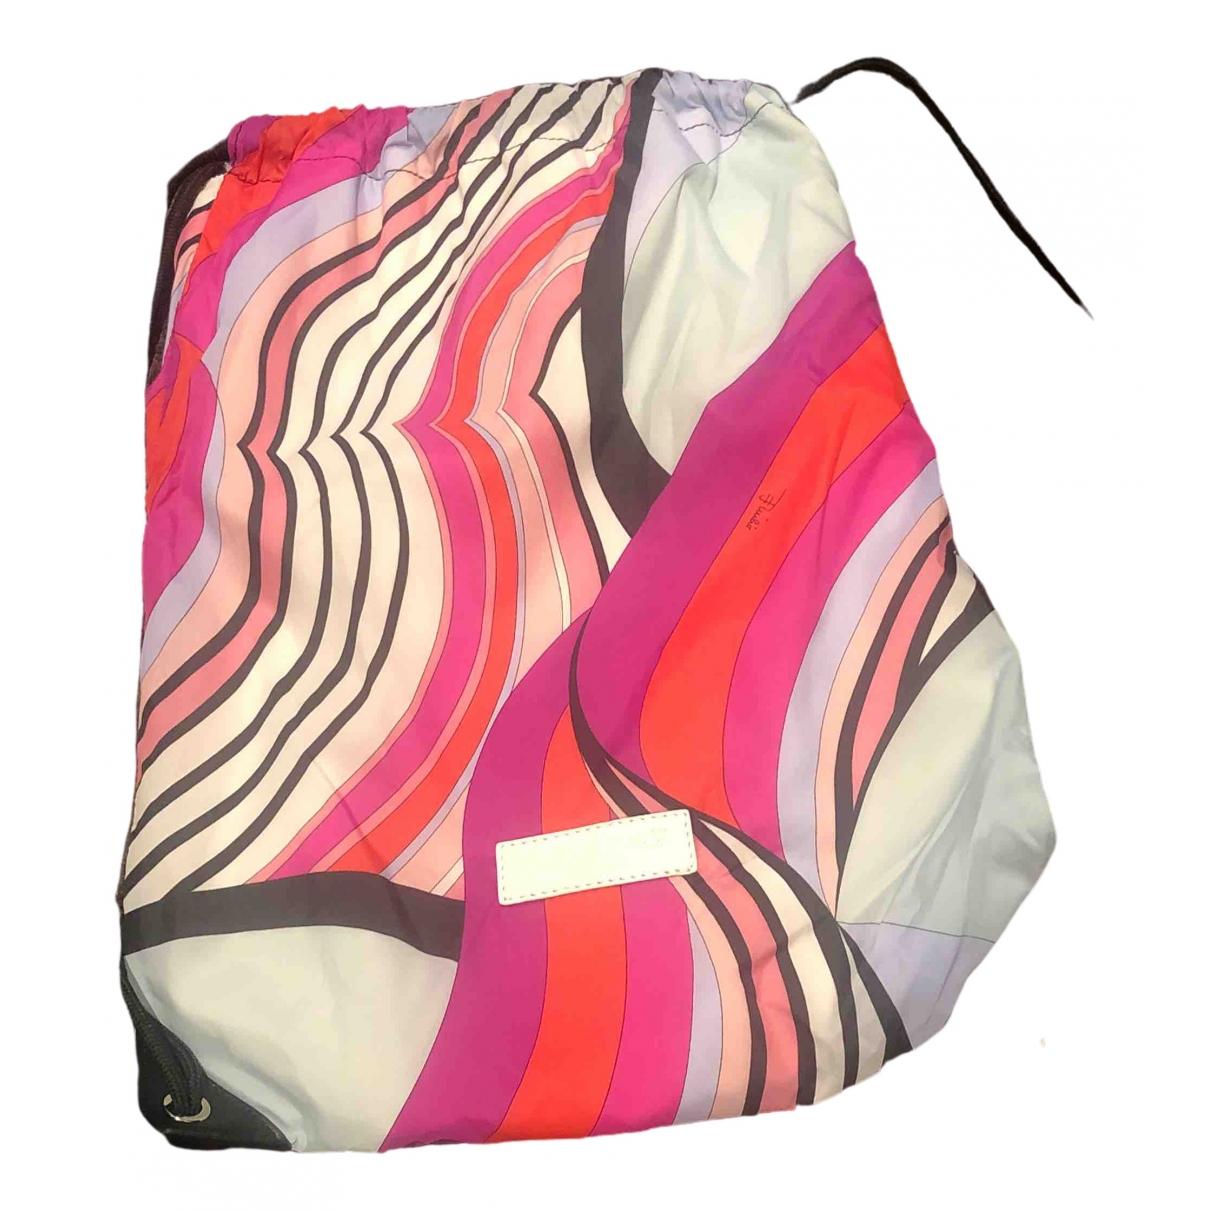 Emilio Pucci \N Multicolour bag & Pencil cases for Kids \N